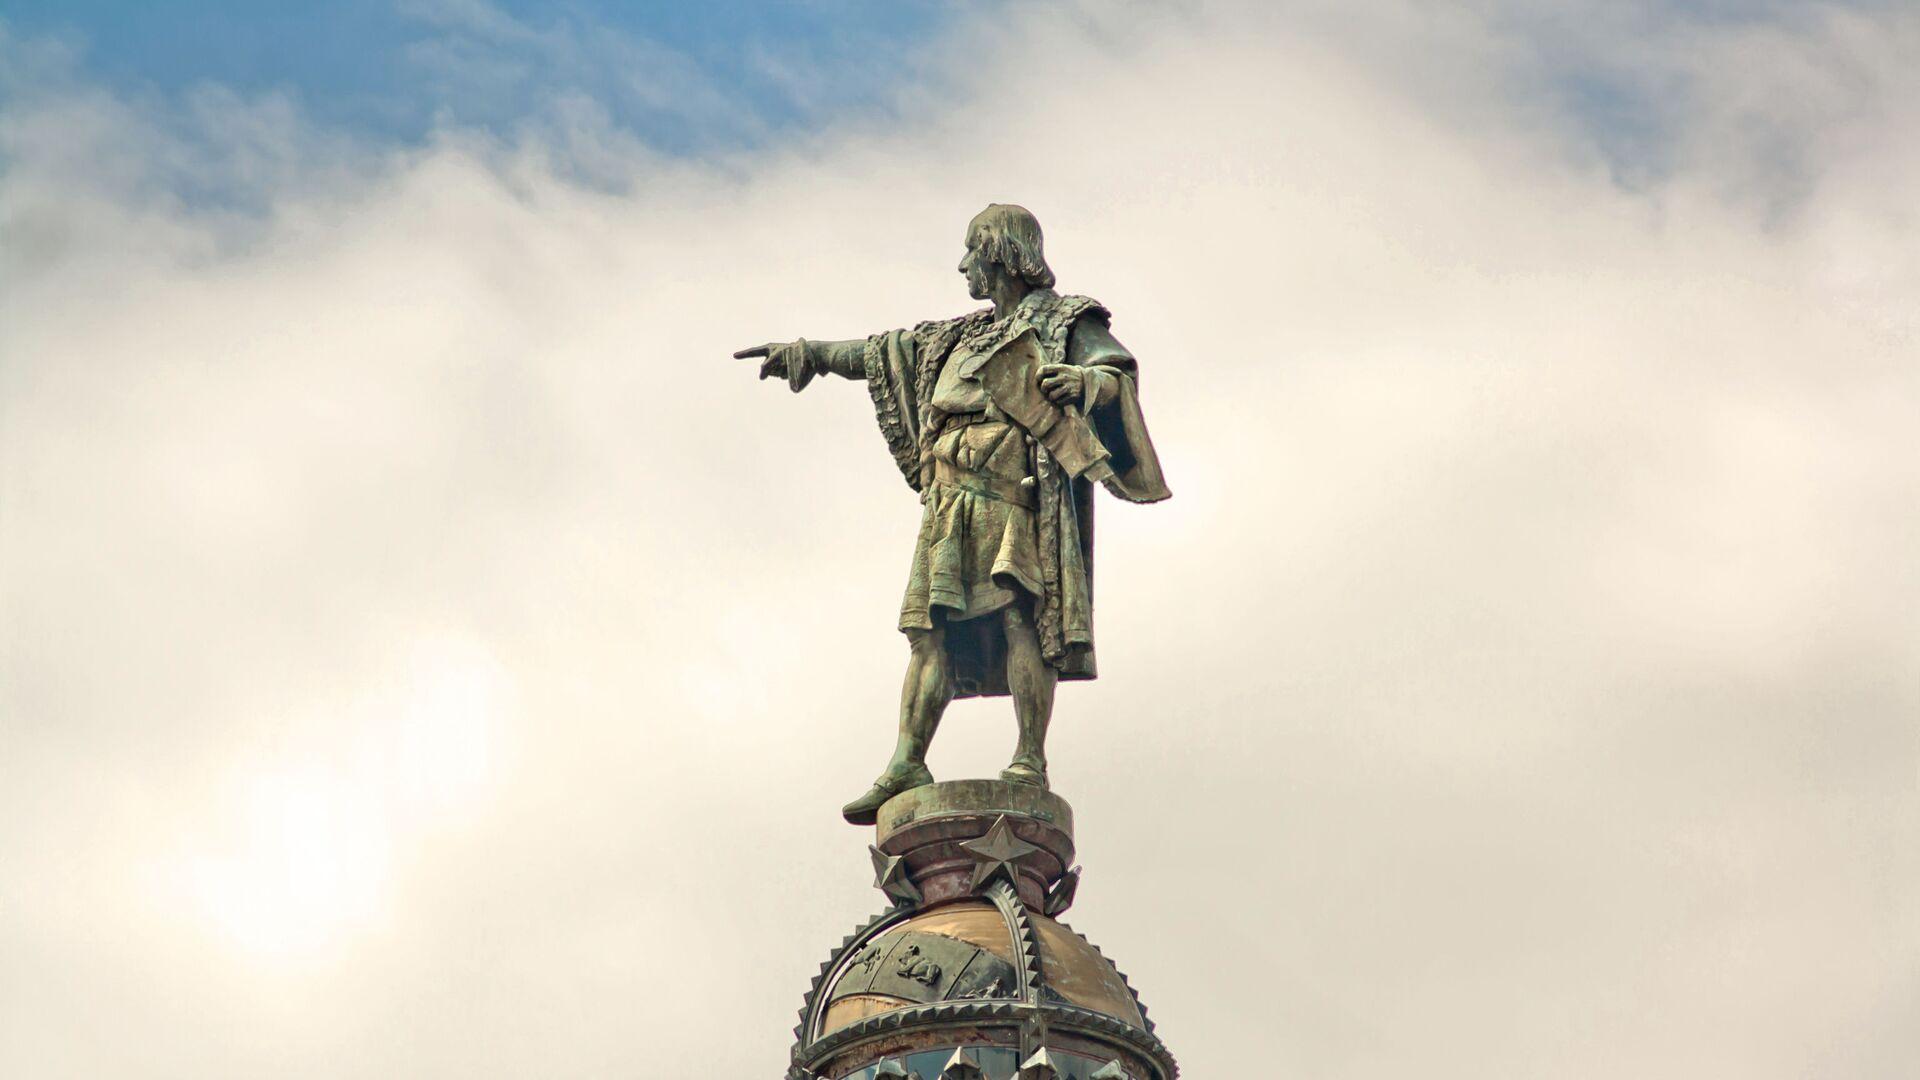 El monumento de Cristóbal Colón en Barcelona, España - Sputnik Mundo, 1920, 11.10.2021